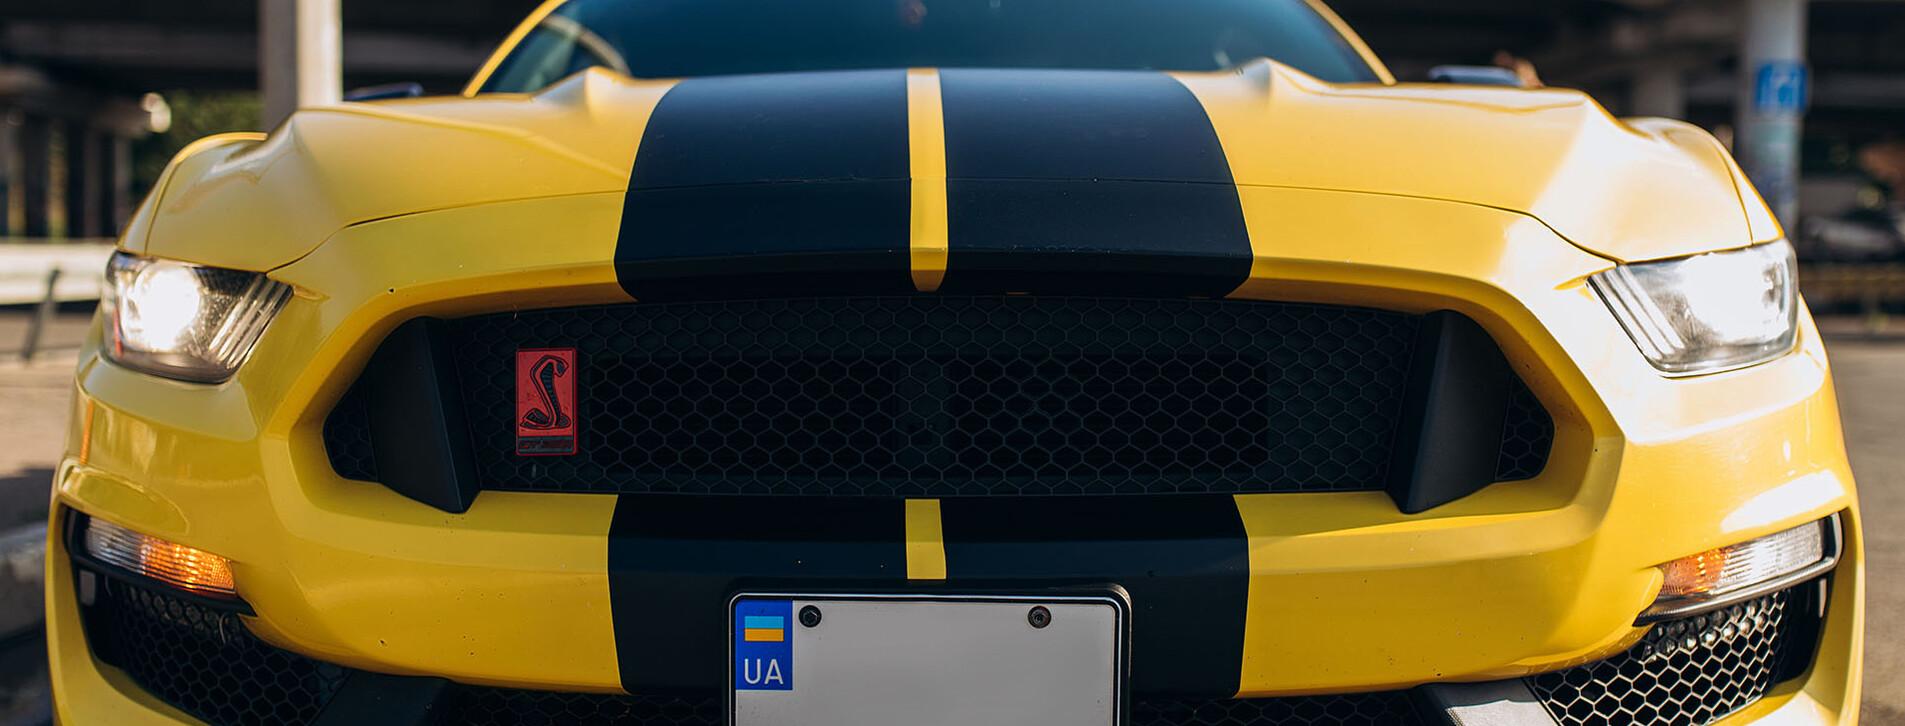 Фото 1 - Тест-драйв Ford Mustang для двоих